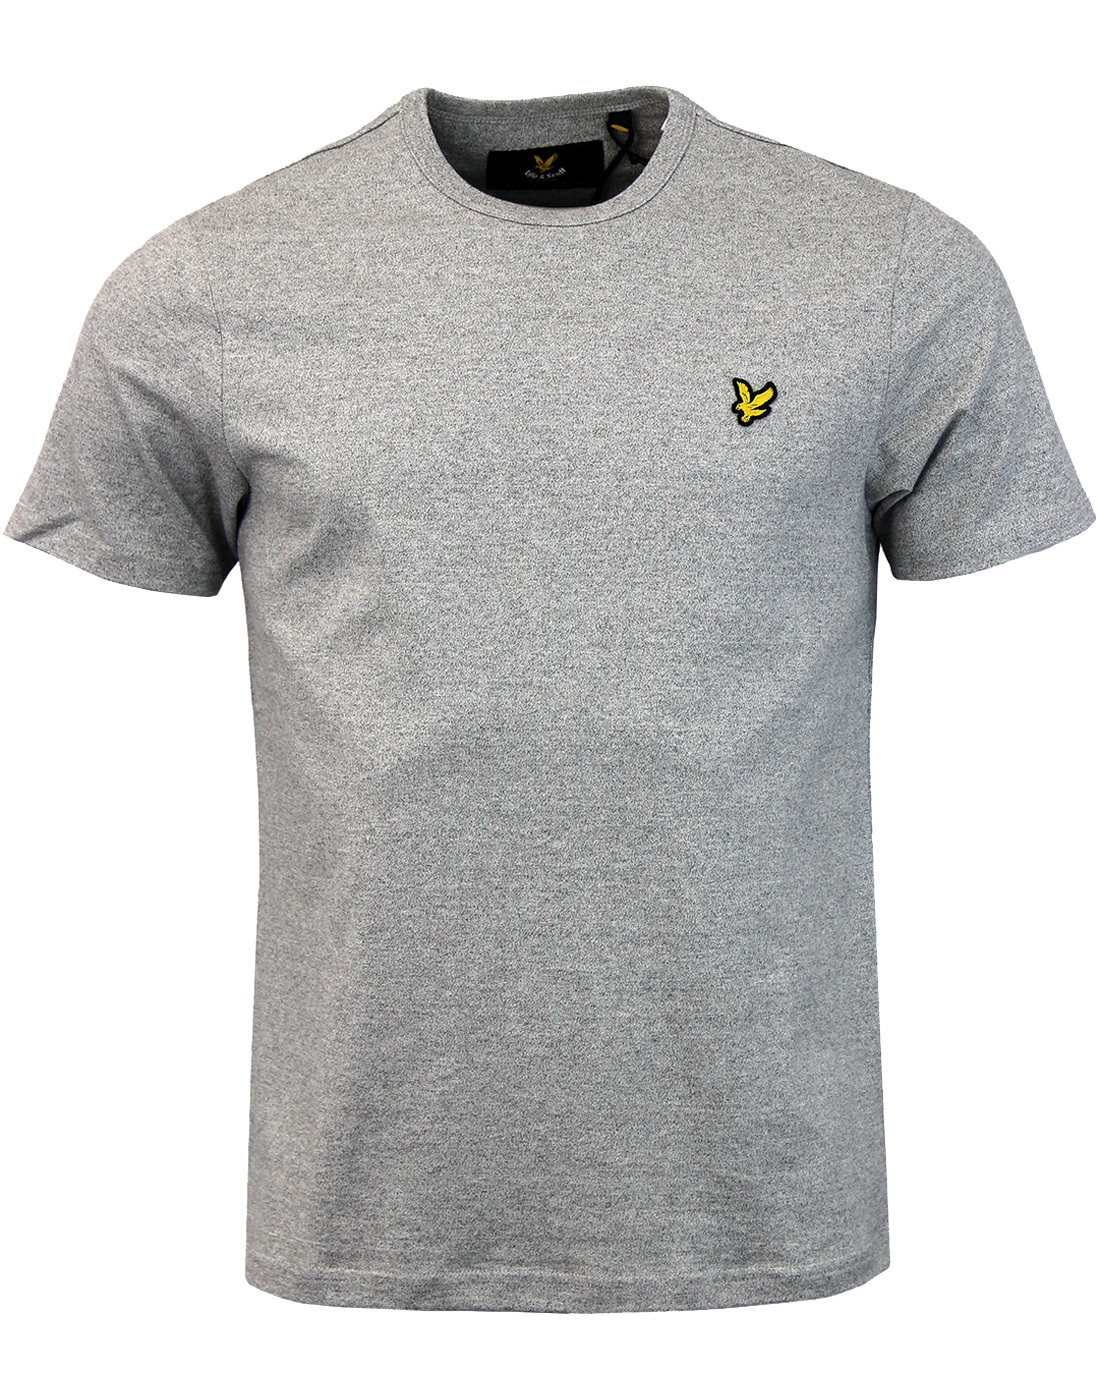 LYLE & SCOTT Retro Indie Mouline Jersey T-Shirt